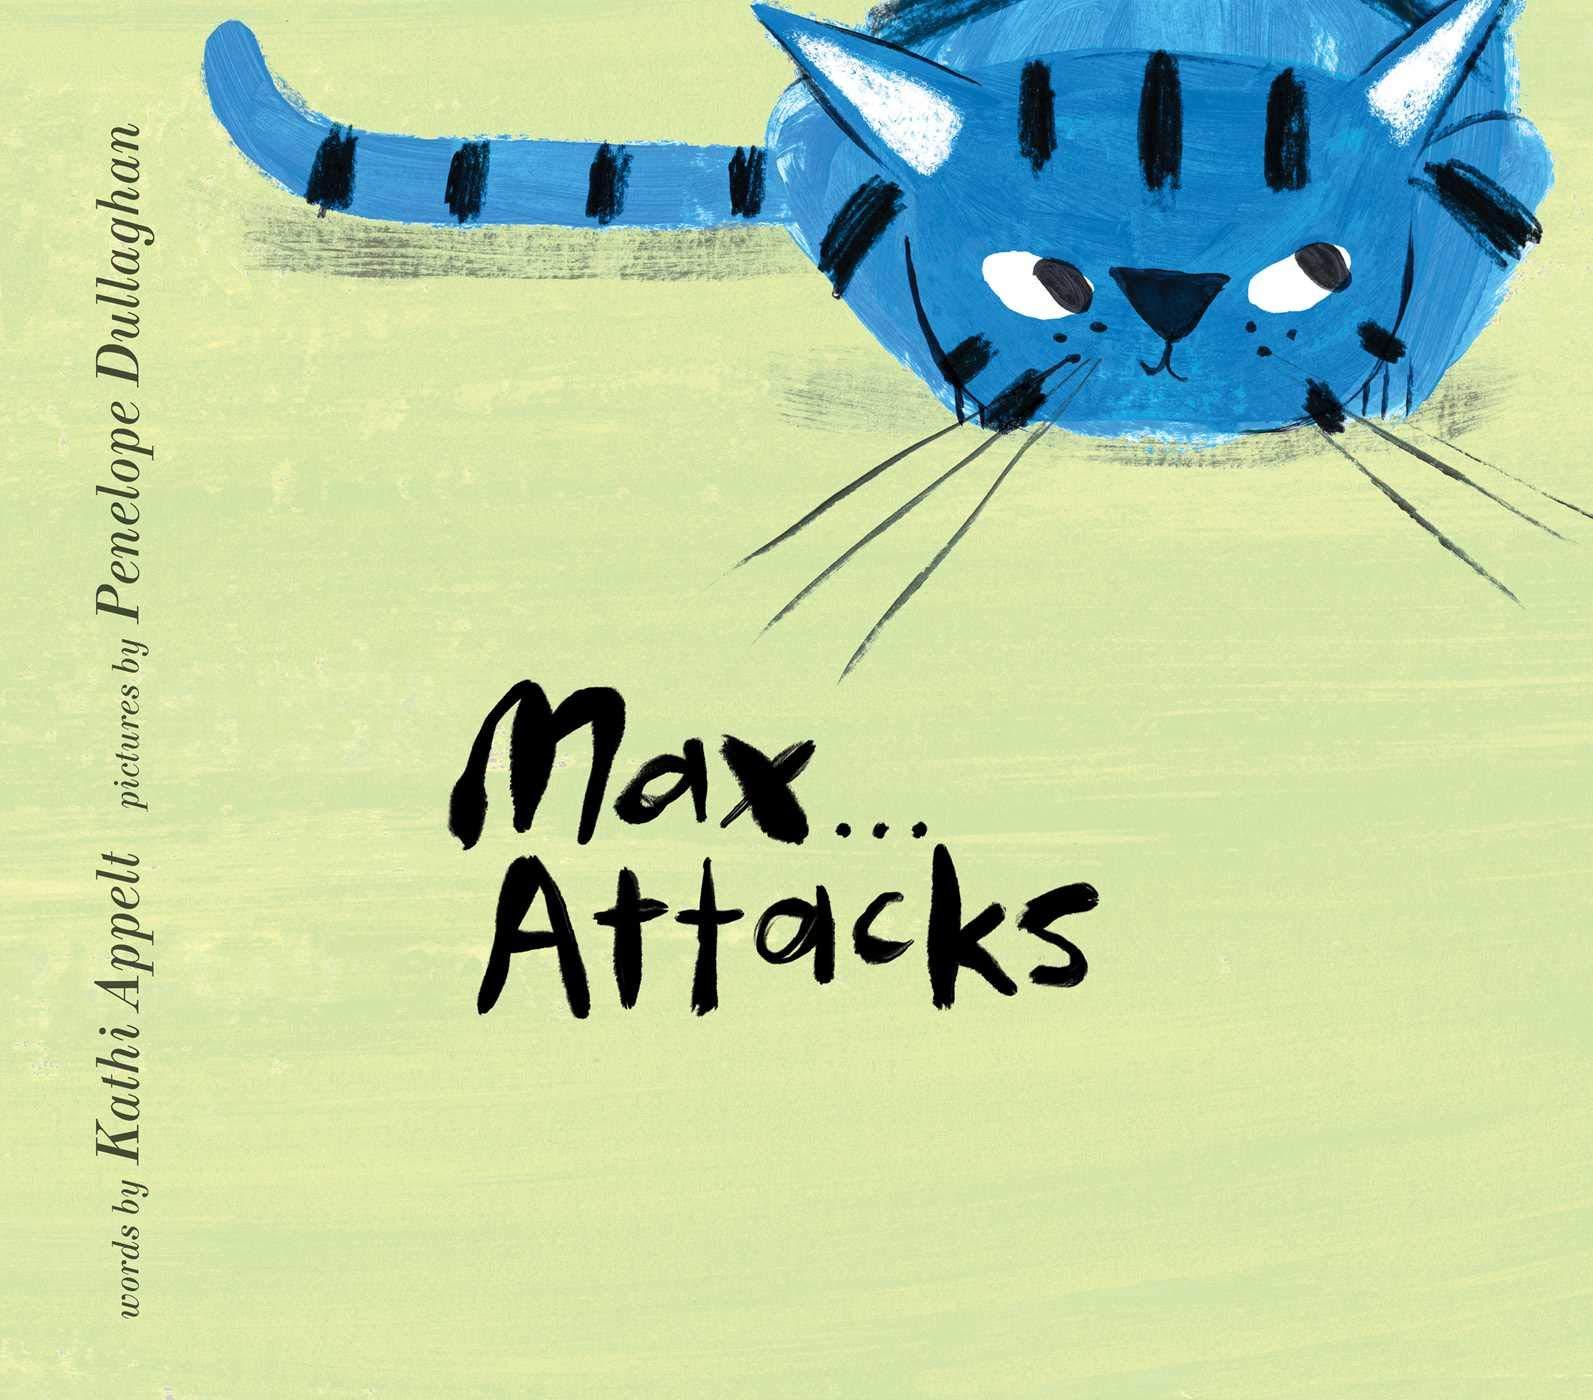 Amazon.com: Max Attacks (9781481451468): Appelt, Kathi, Dullaghan ...